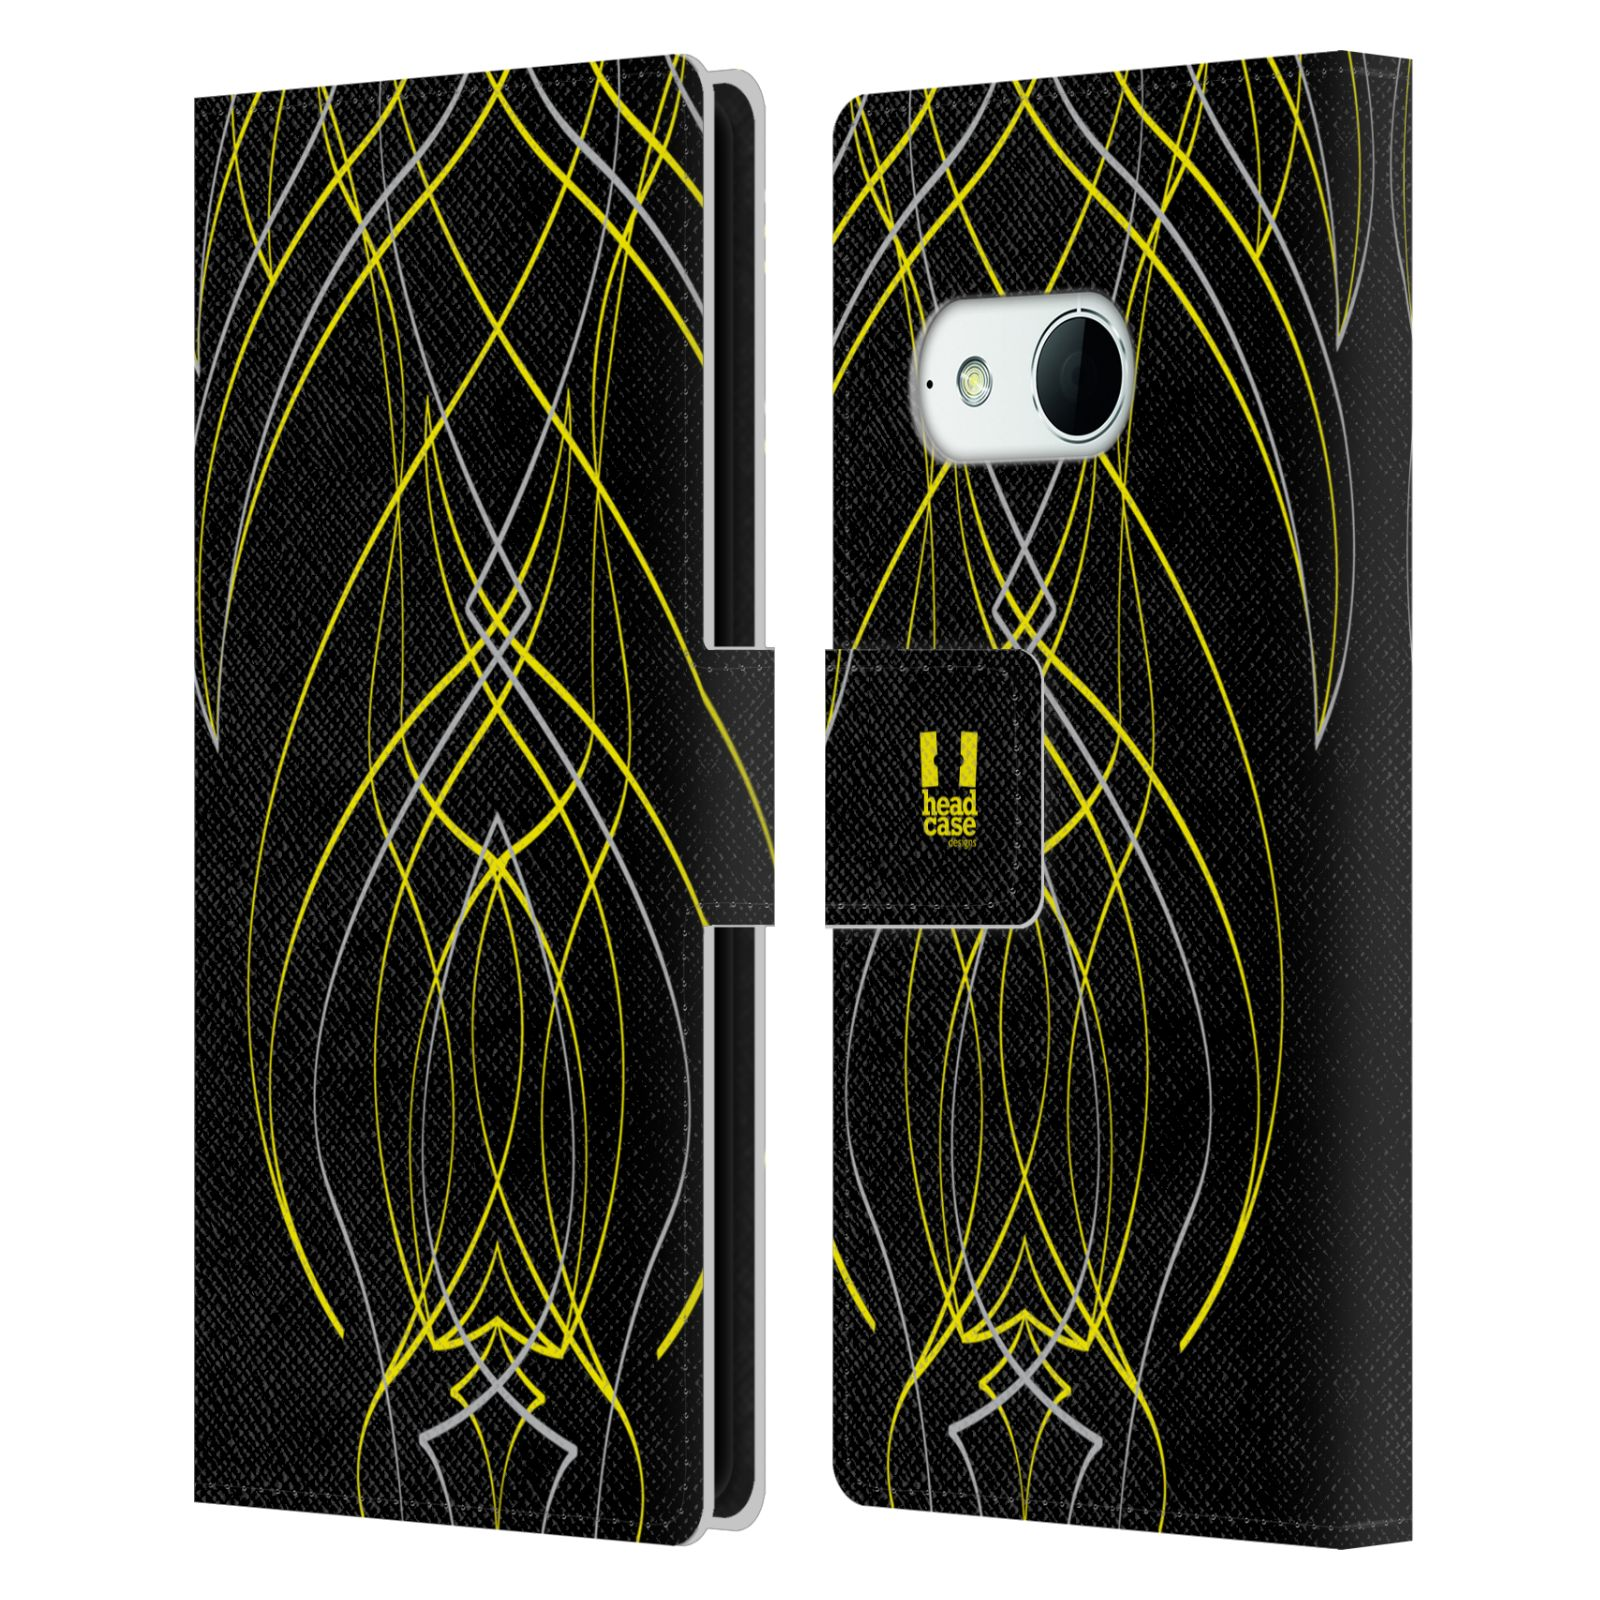 HEAD CASE Flipové pouzdro pro mobil HTC ONE MINI 2 (M8) barevné proužky tvary žlutá